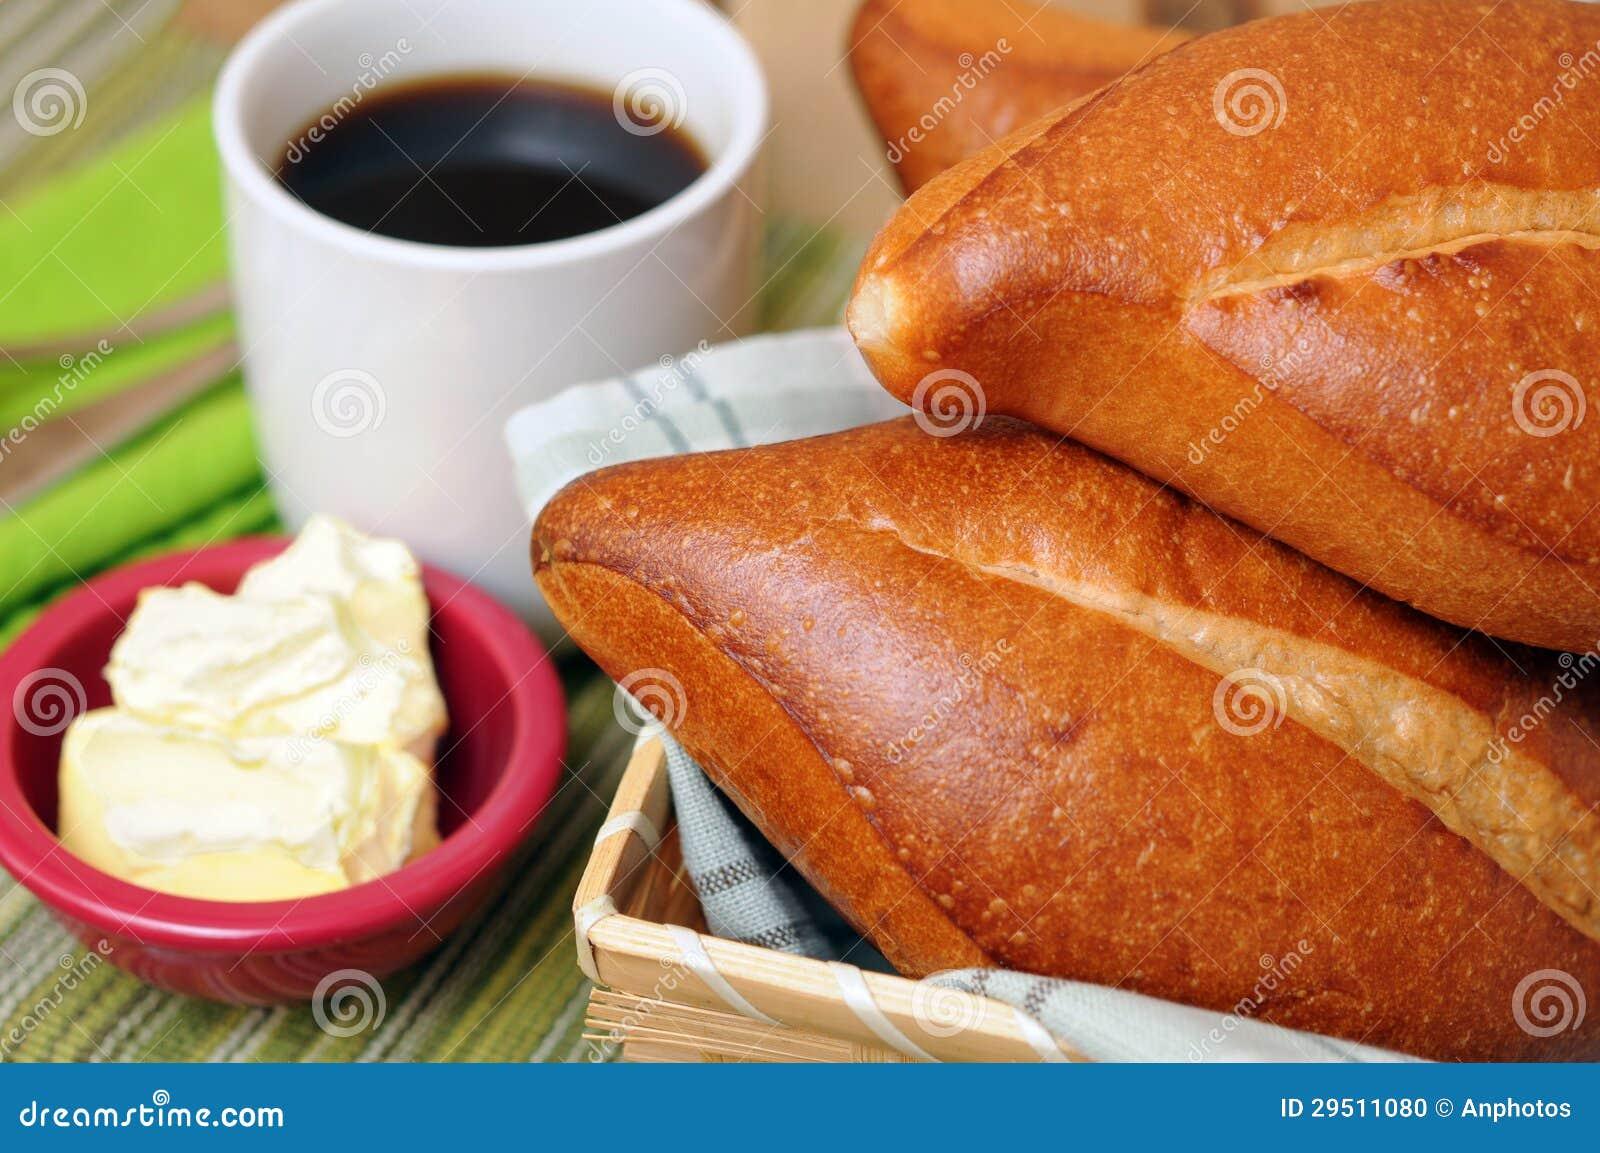 Ontbijt met koffie en brood